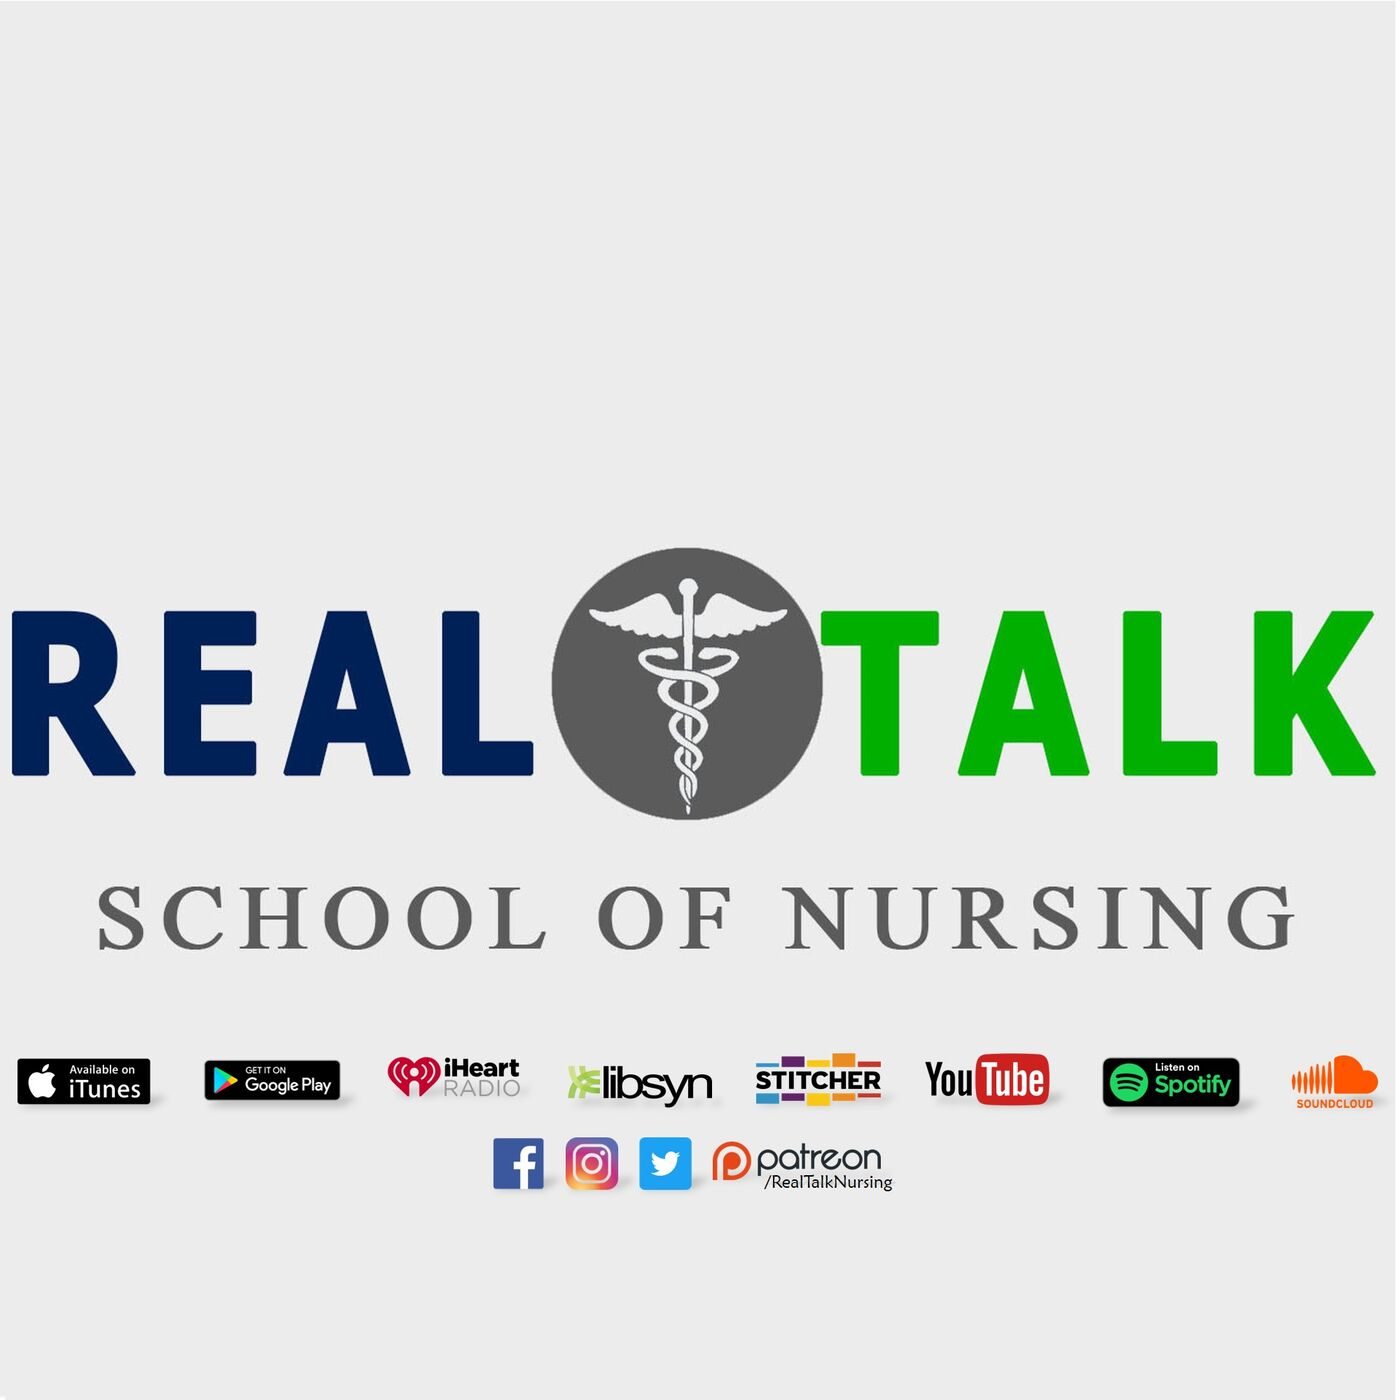 #96 Get Into Nursing